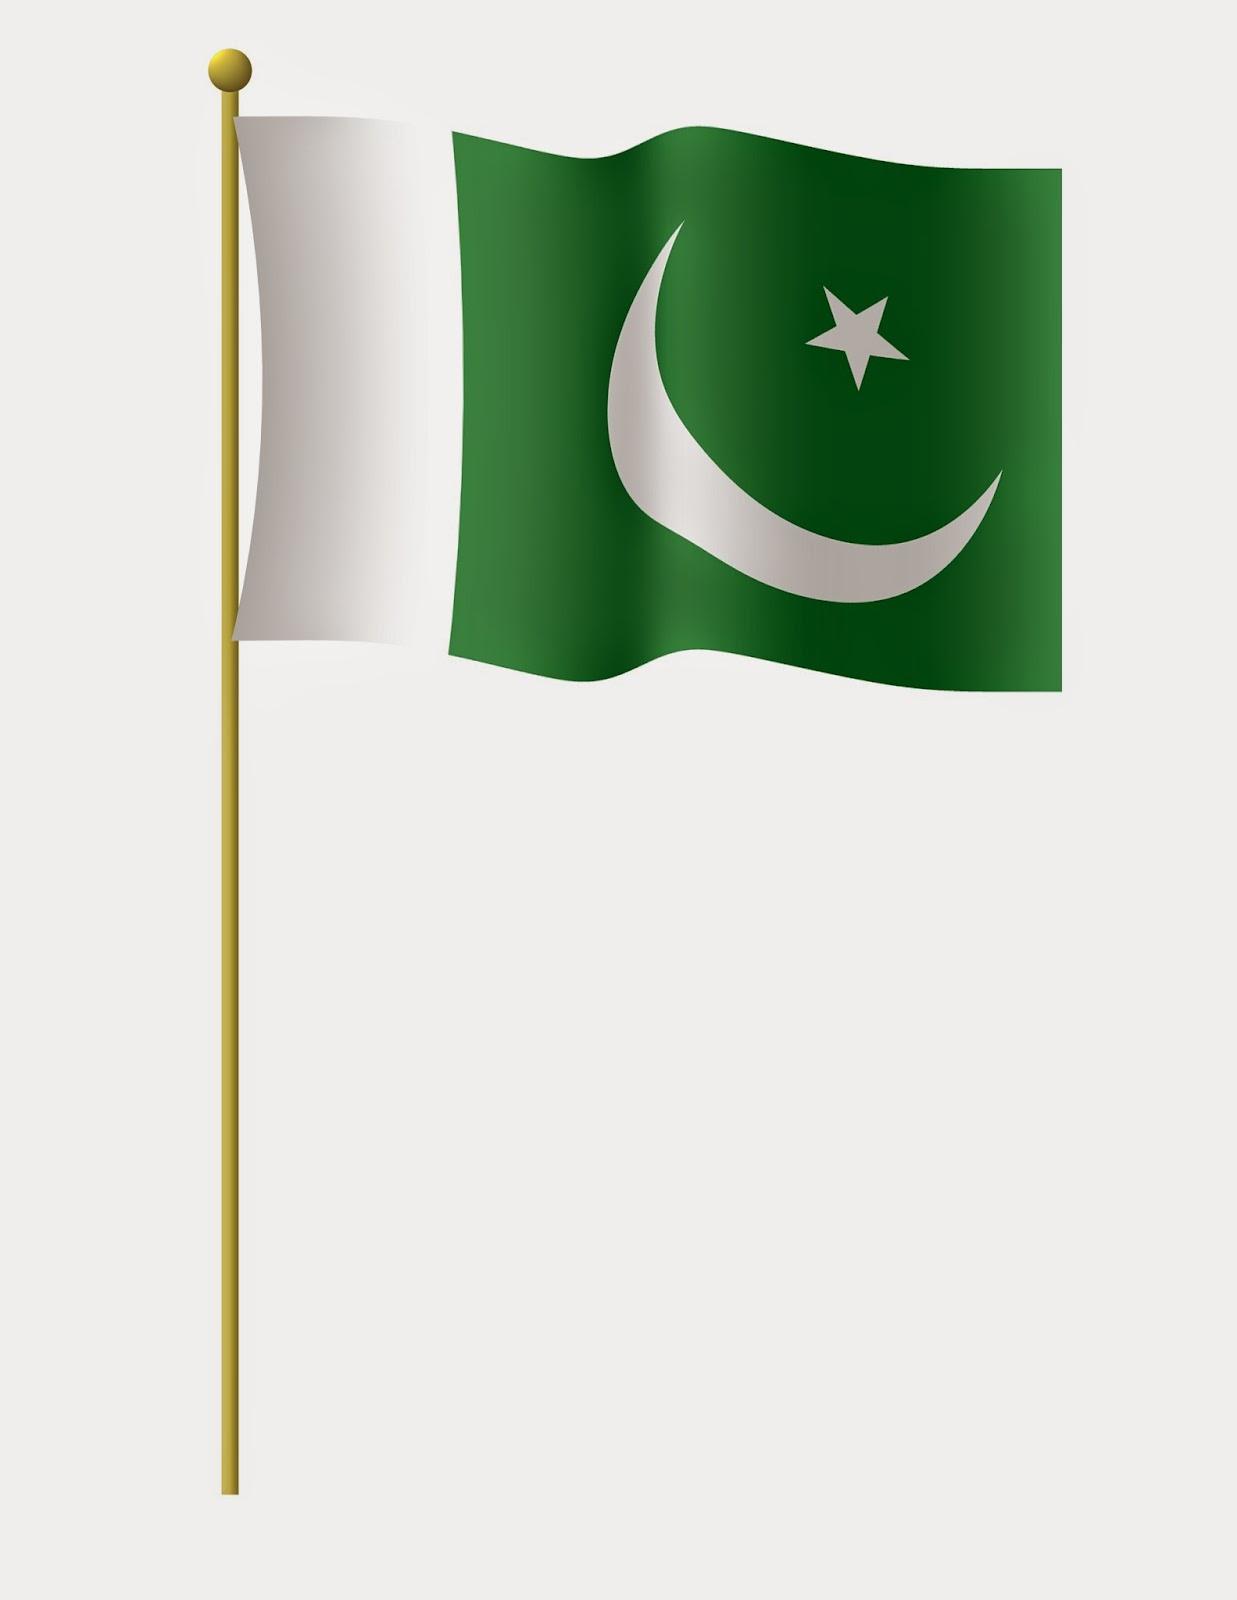 High Resolution Wallpaper | Flag Of Pakistan 1237x1600 px